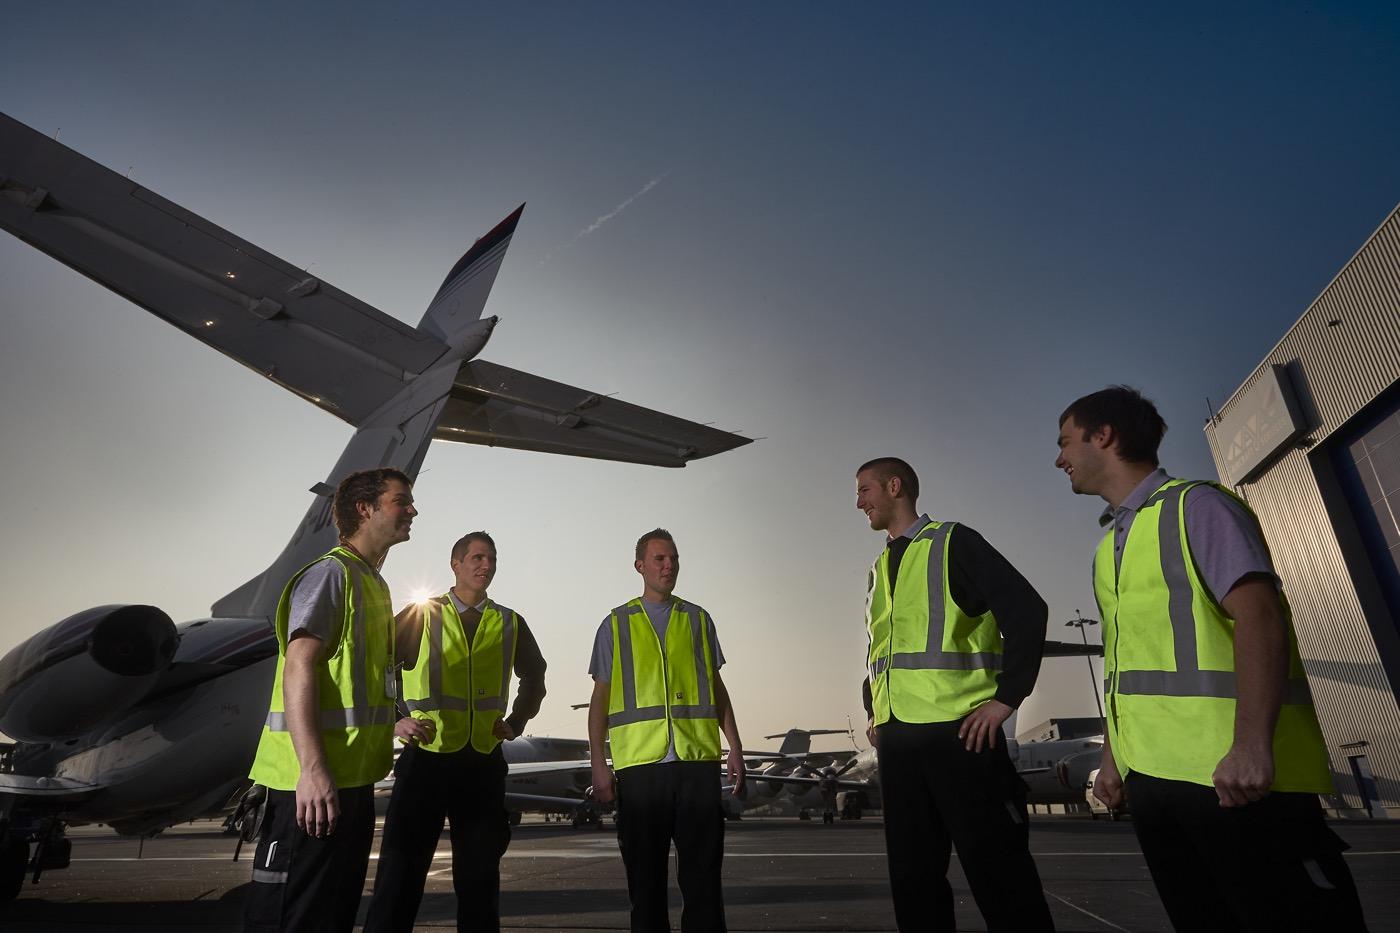 Luftverkehr, Aerospace, Industriefotografie, Köln